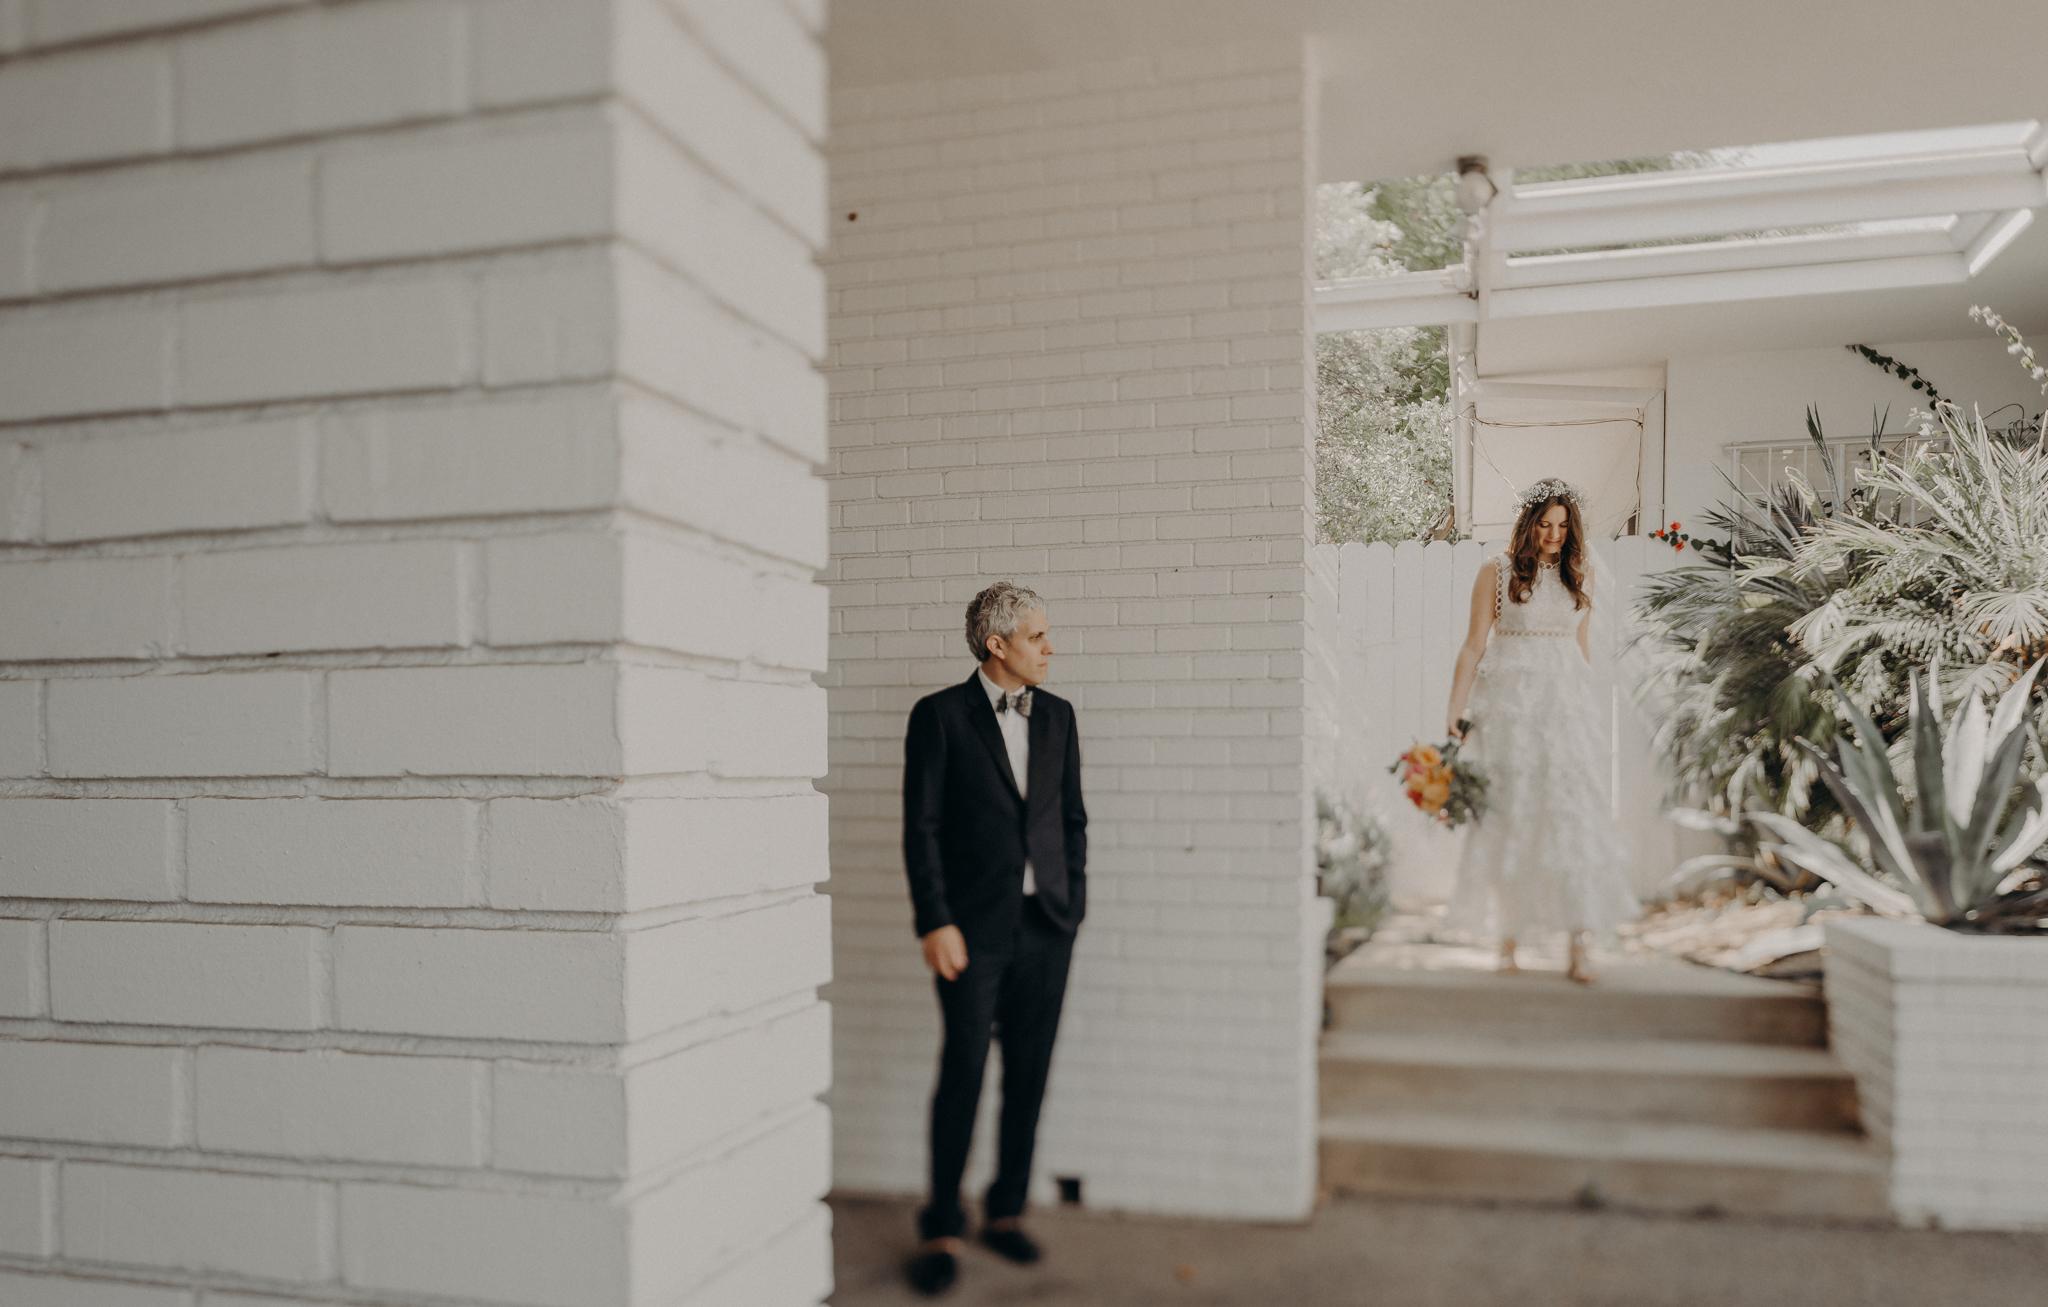 Isaiah + Taylor Photography - Private Estate Backyard Wedding - Beverly Hills - Los Angeles Wedding Photographer - 27.jpg